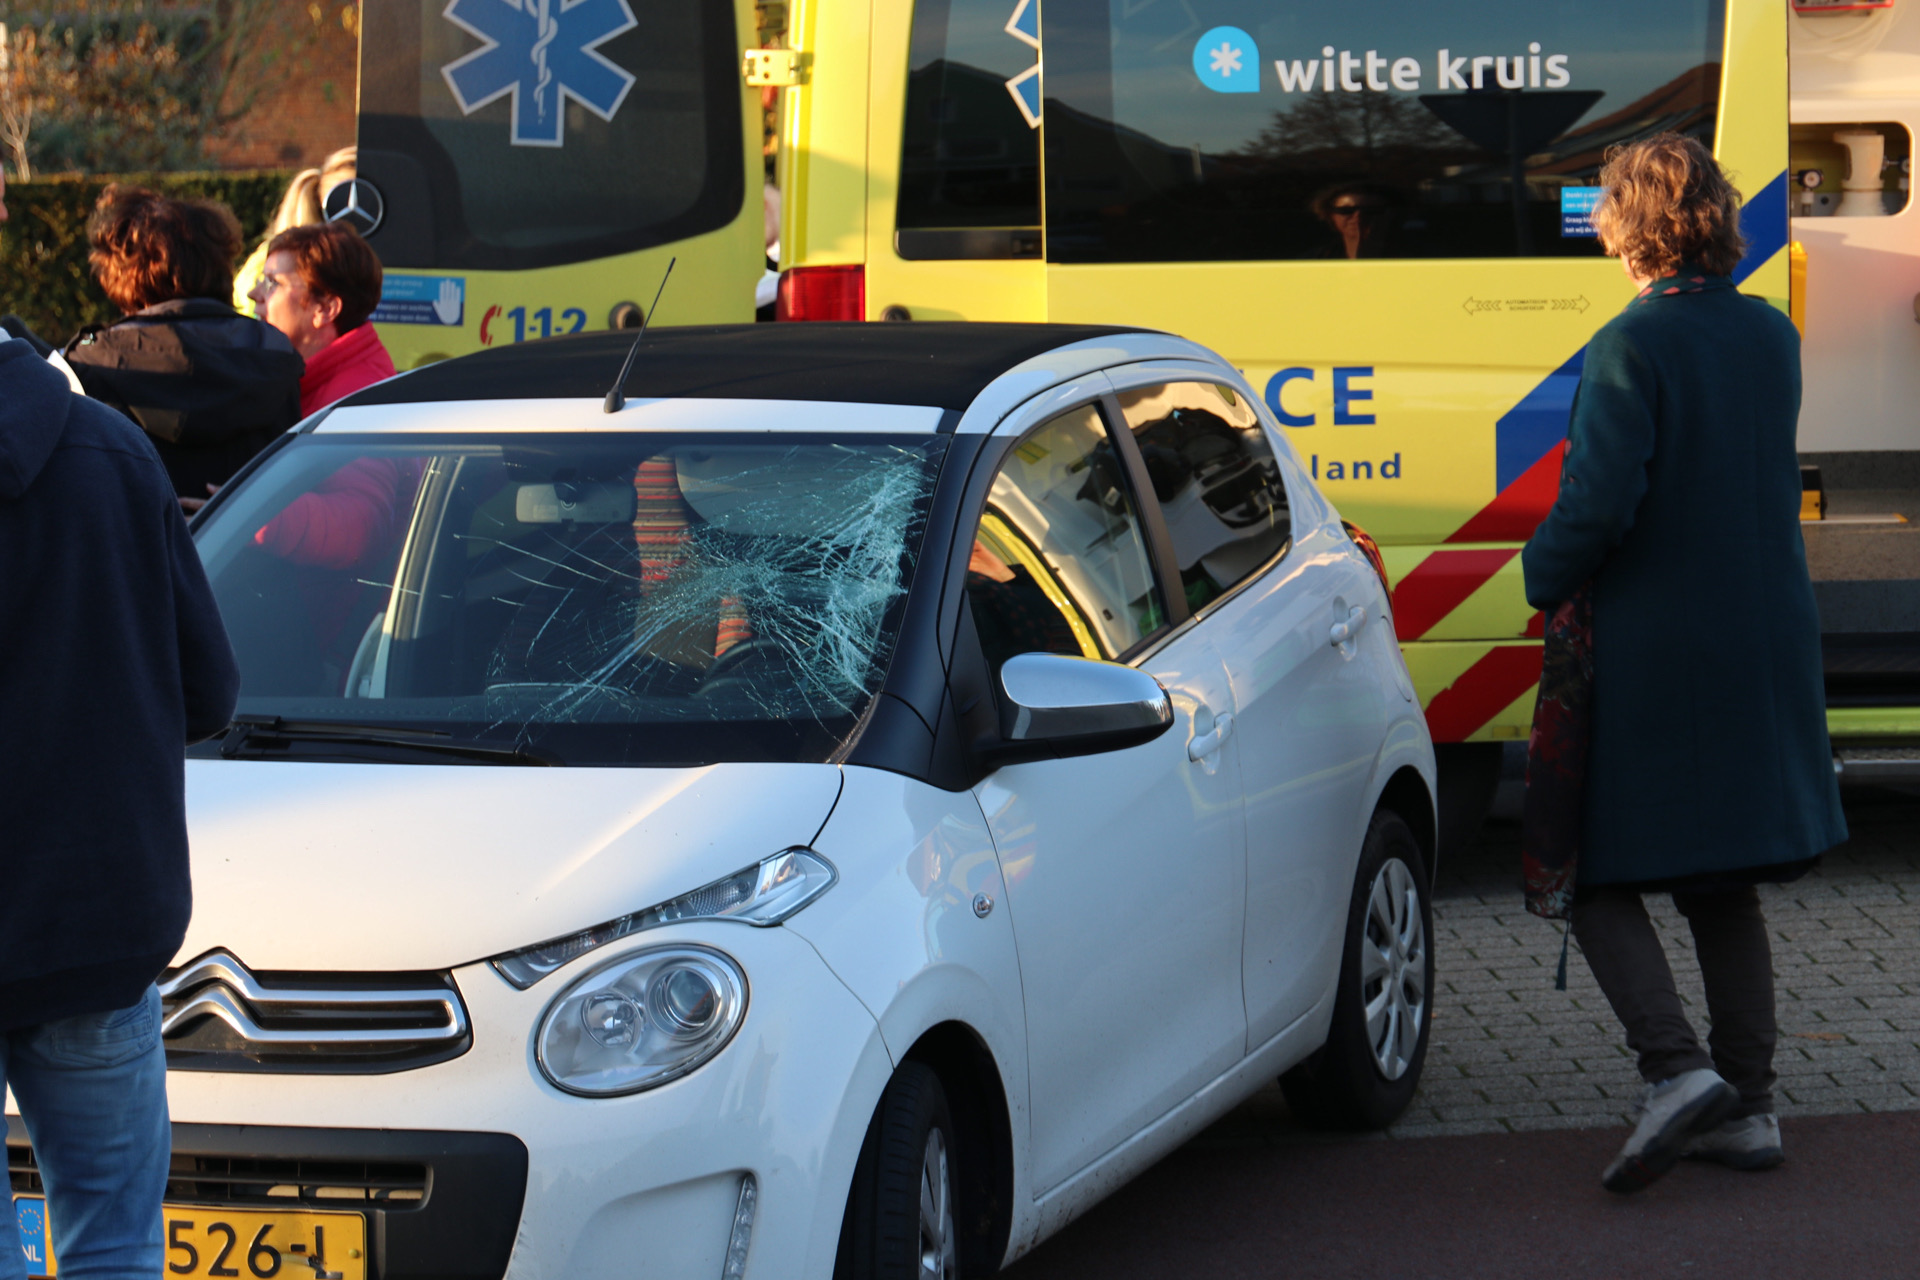 Fietser zwaargewond na botsing met auto in Klarenbeek